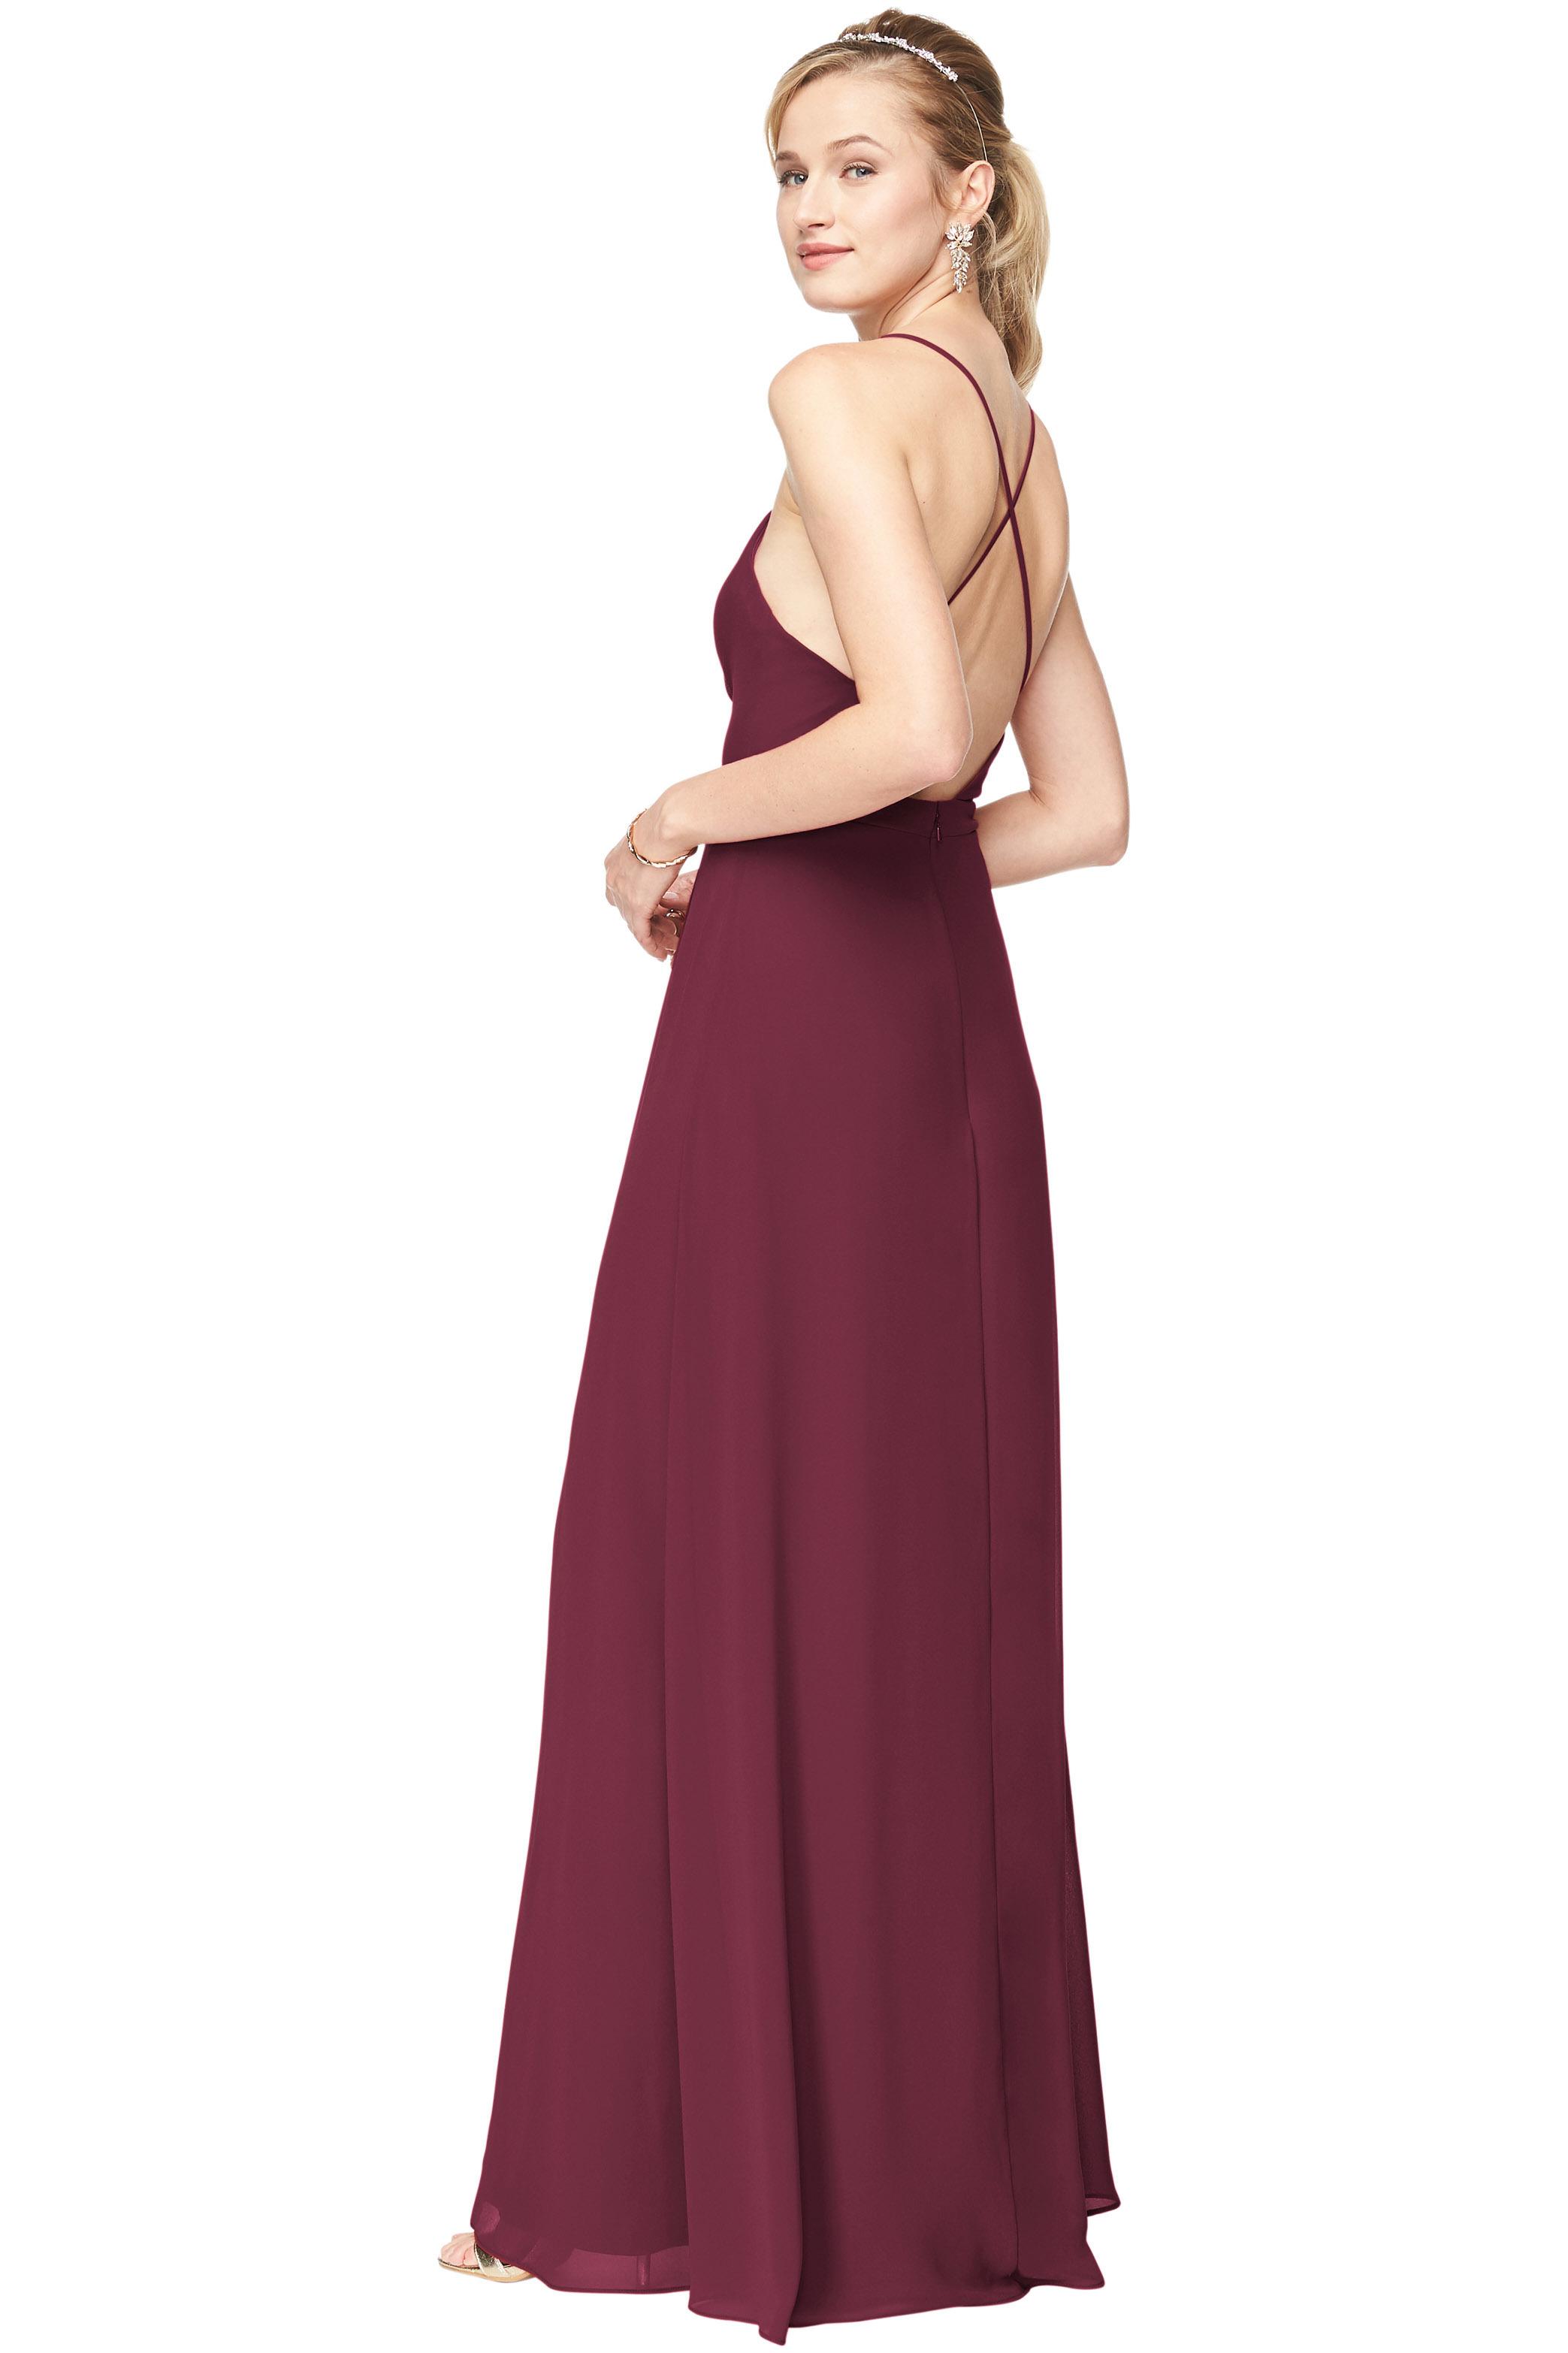 Bill Levkoff SANGRIA Chiffon Surplice A-Line gown, $178.00 Back